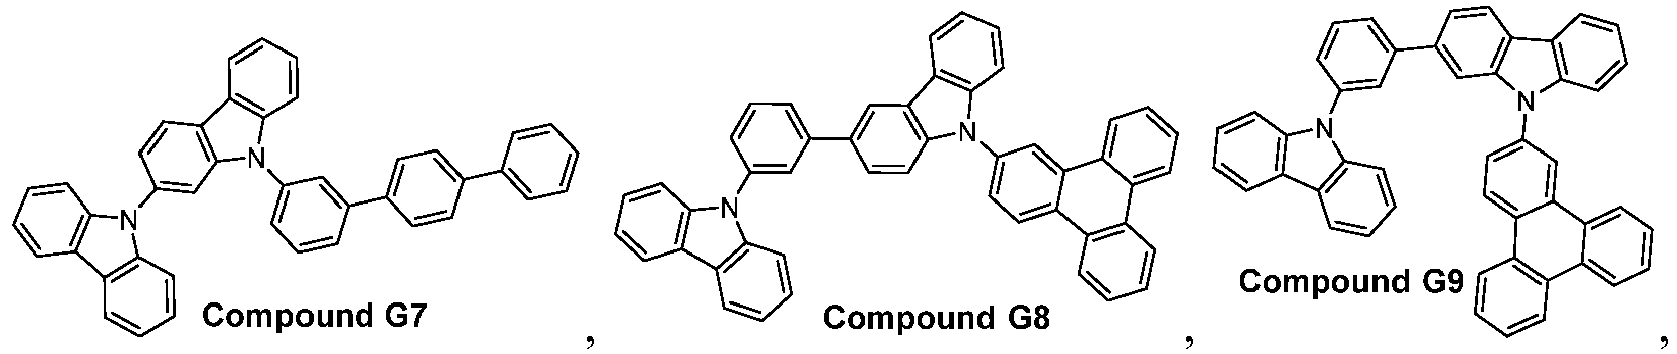 Figure imgb0537